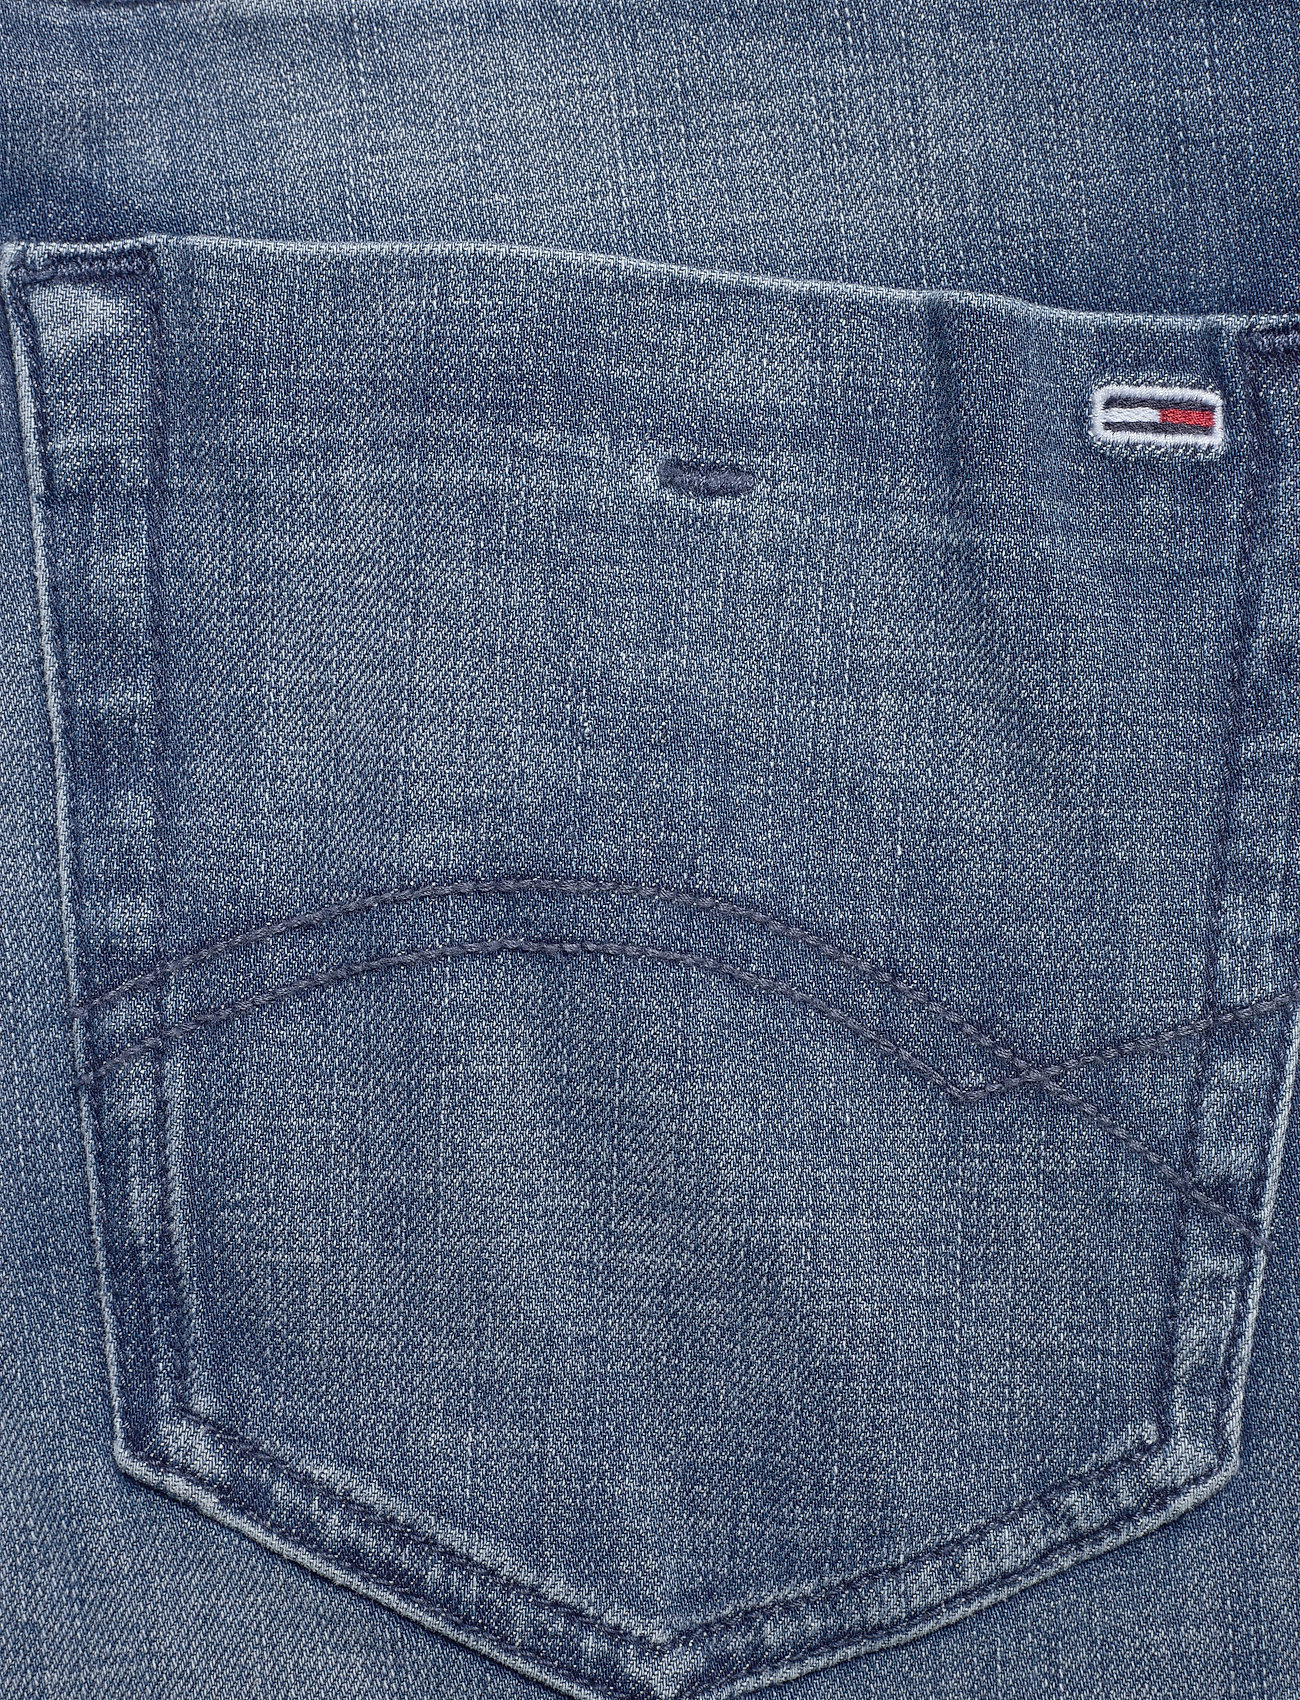 Tommy Jeans Scanton Slim Dycrm - Dynamic Cross Mid St